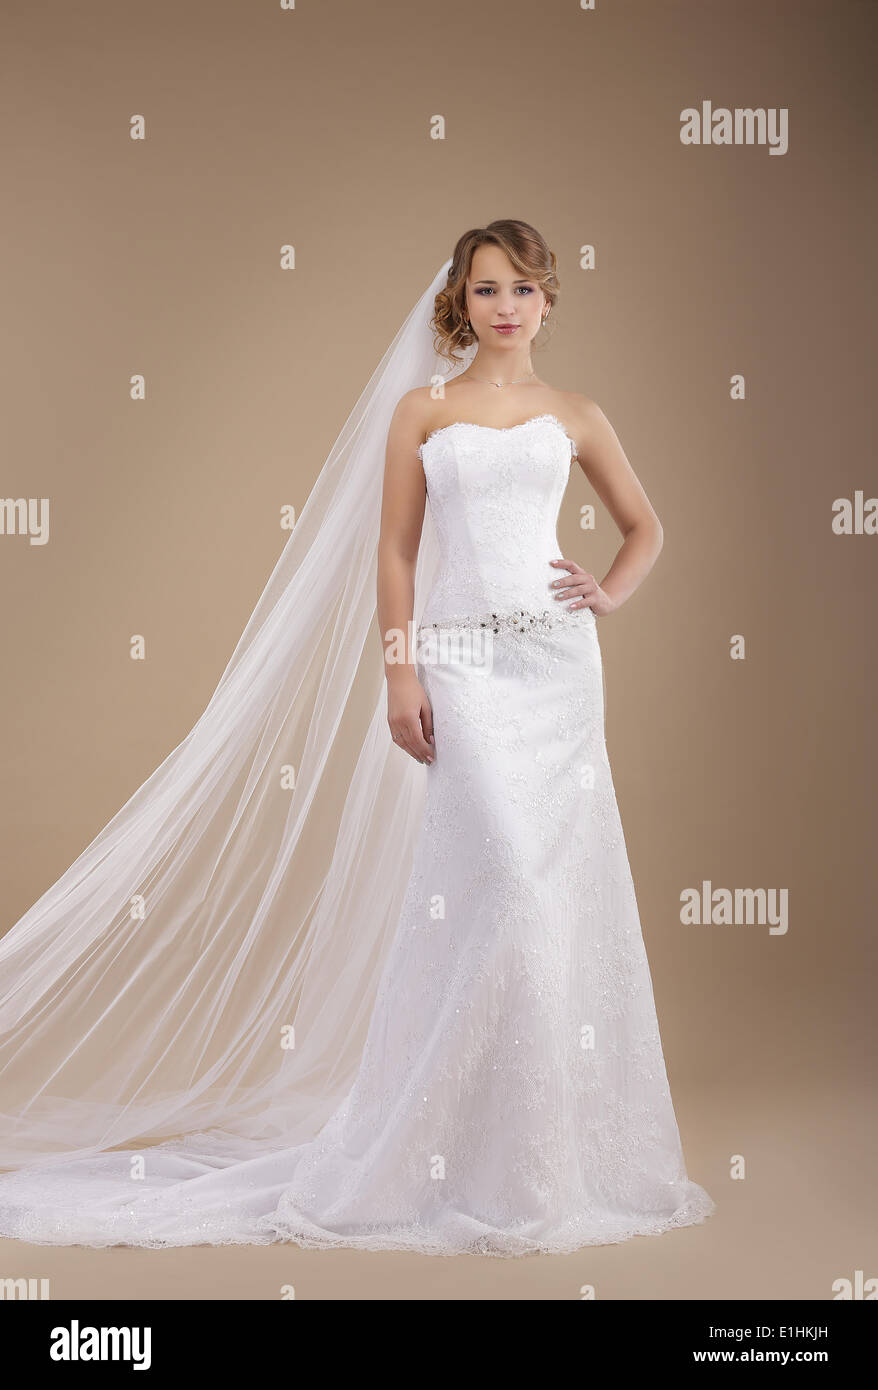 Engagement. Bride wearing Sleeveless Ivory Dress and Veil - Stock Image